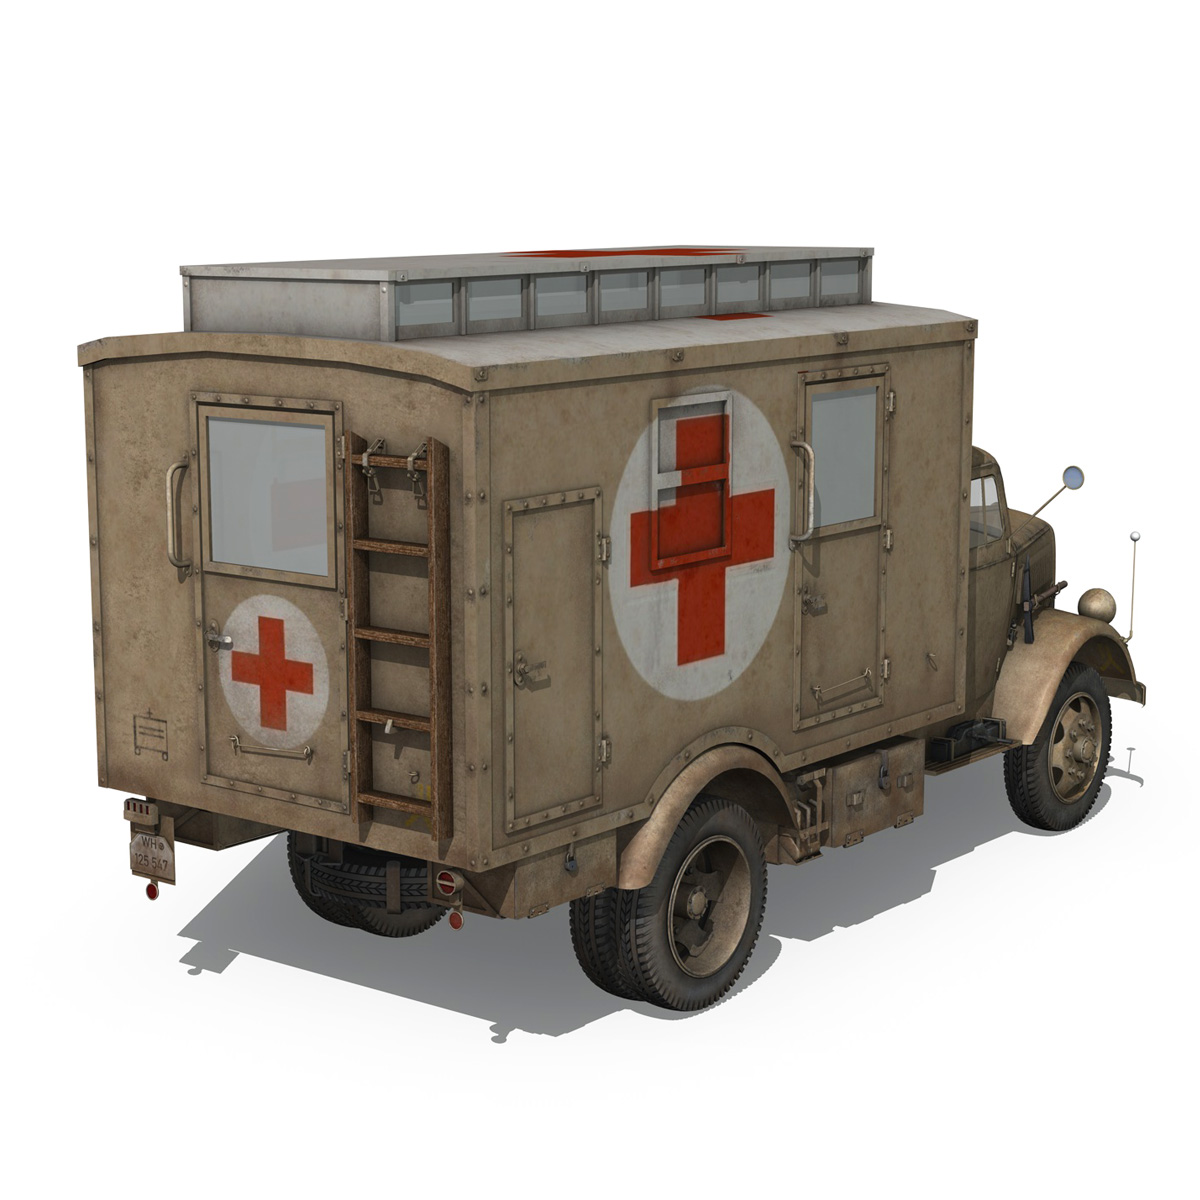 opel blitz – 3t ambulance truck – 2 pzdiv 3d model 3ds c4d fbx lwo lw lws obj 265757